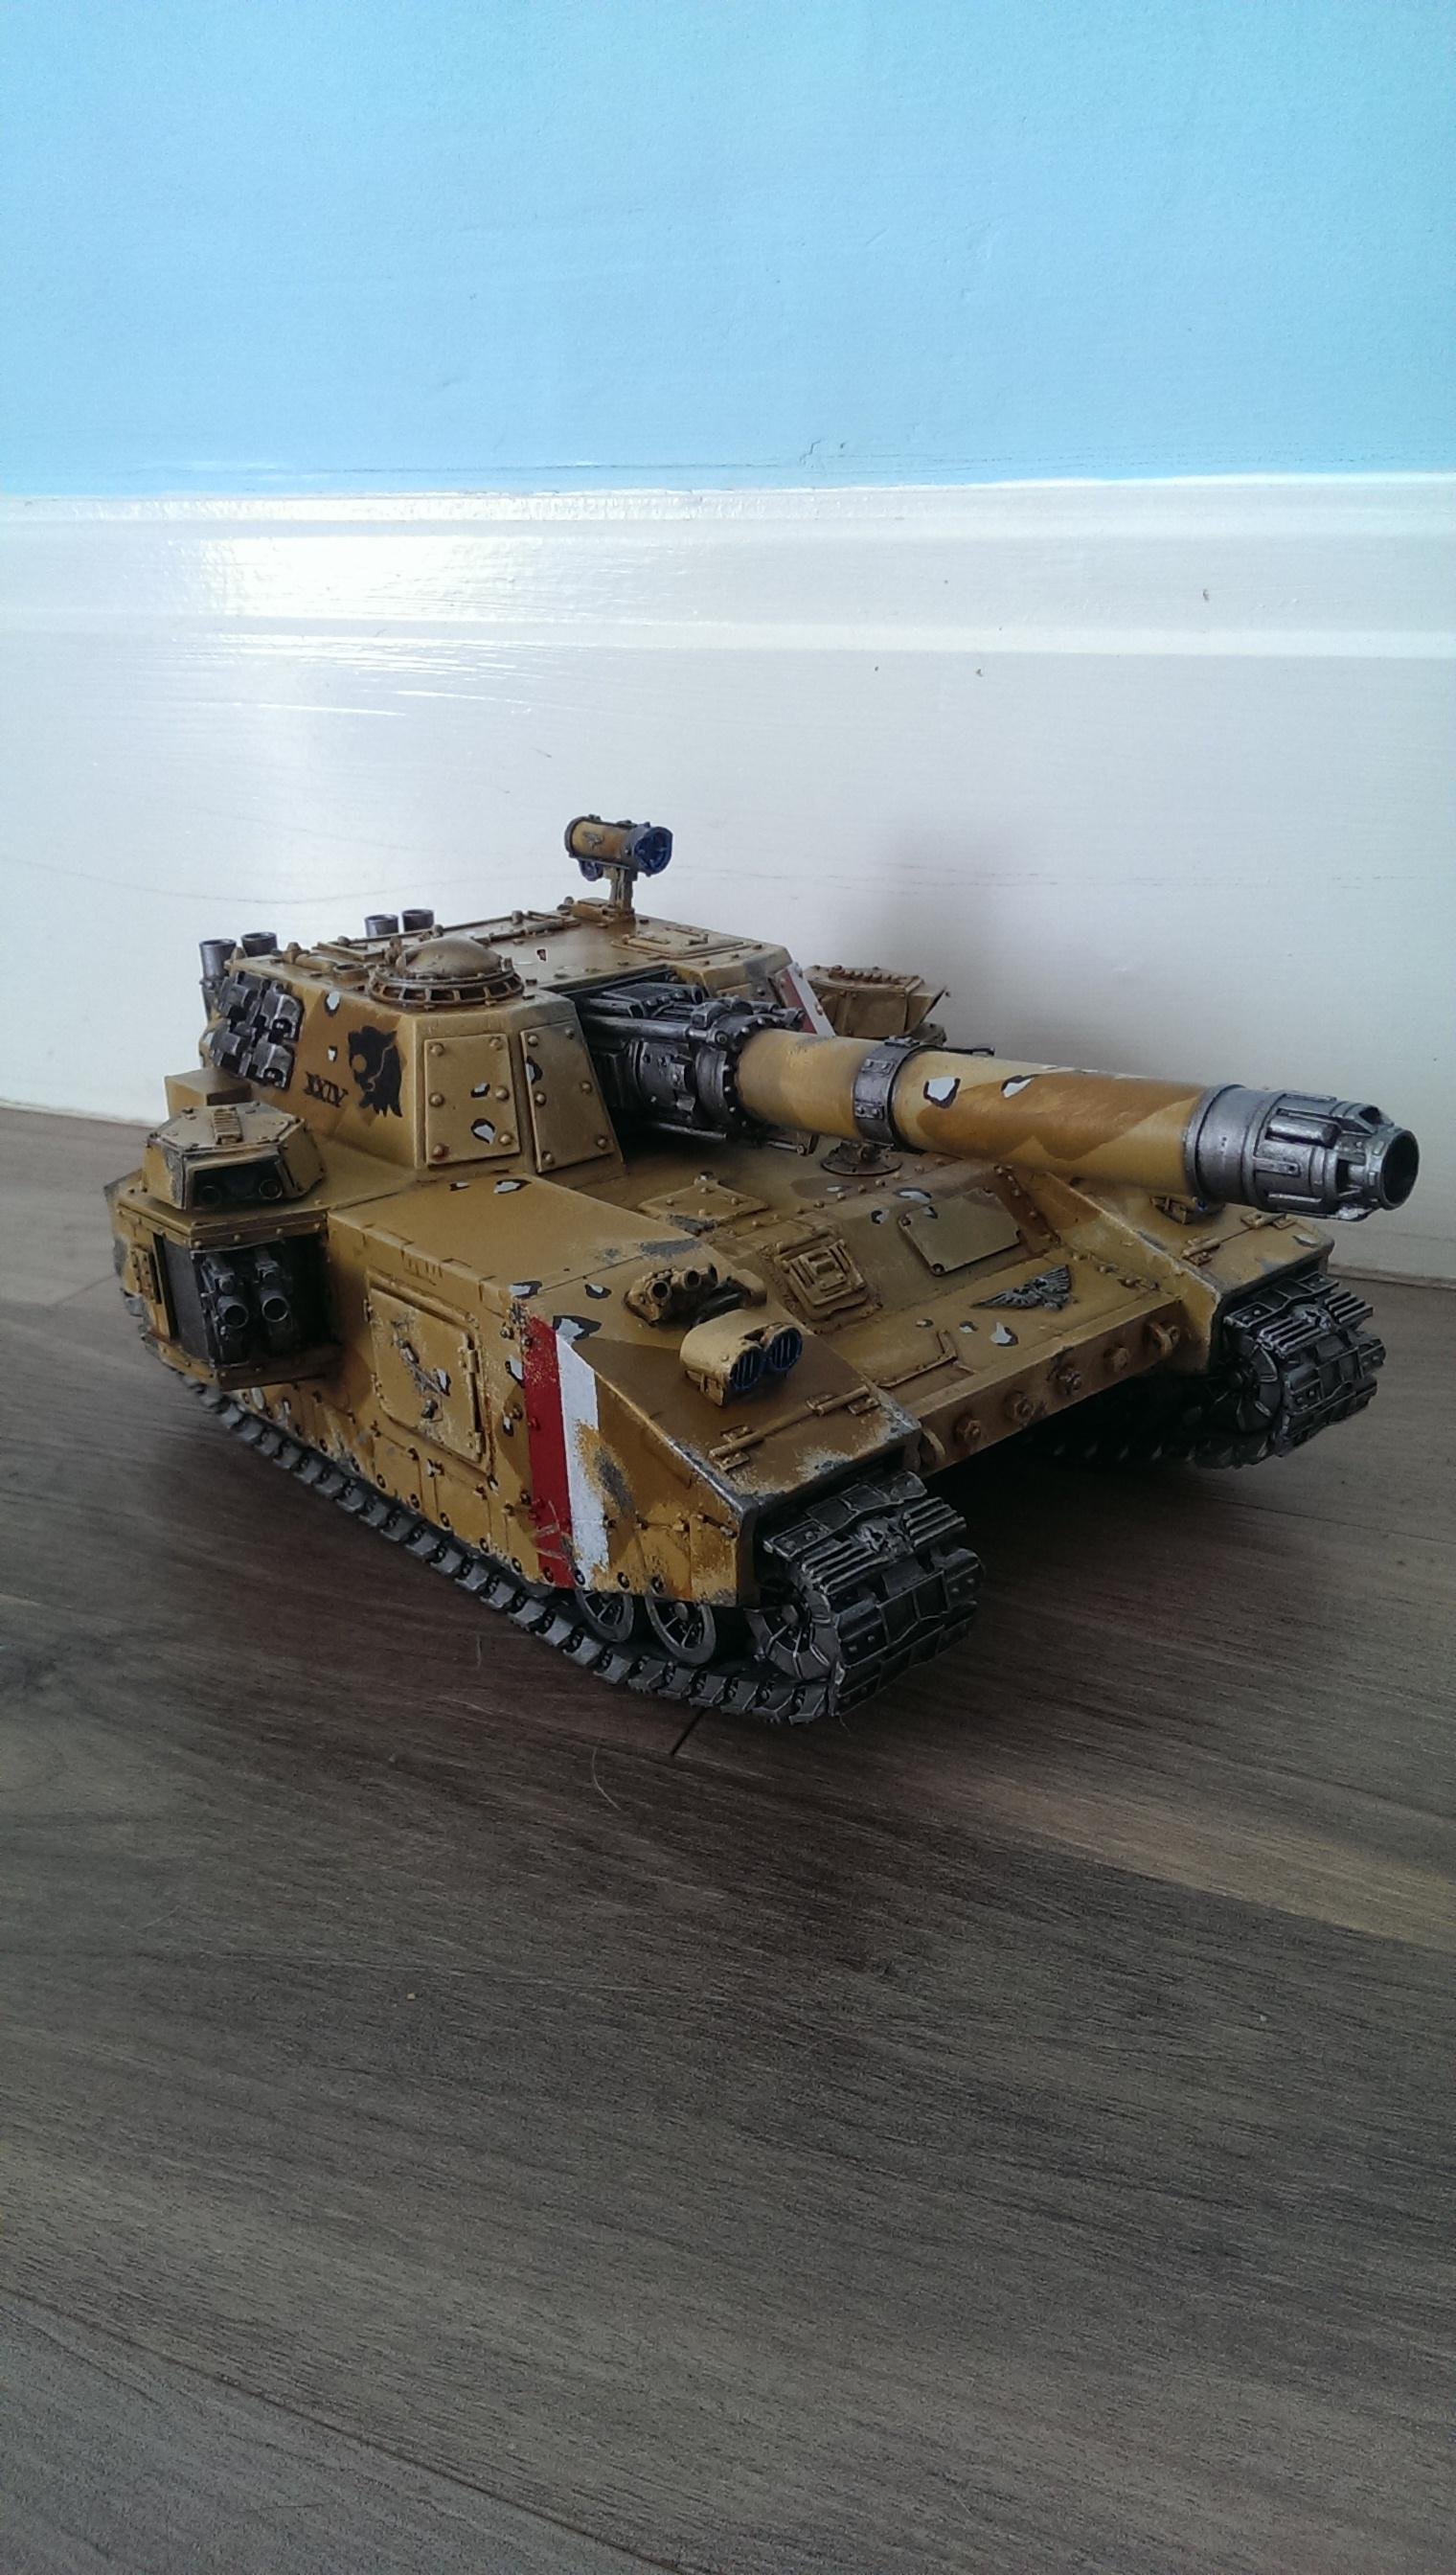 Imperial Guard, Super-heavy, Tank